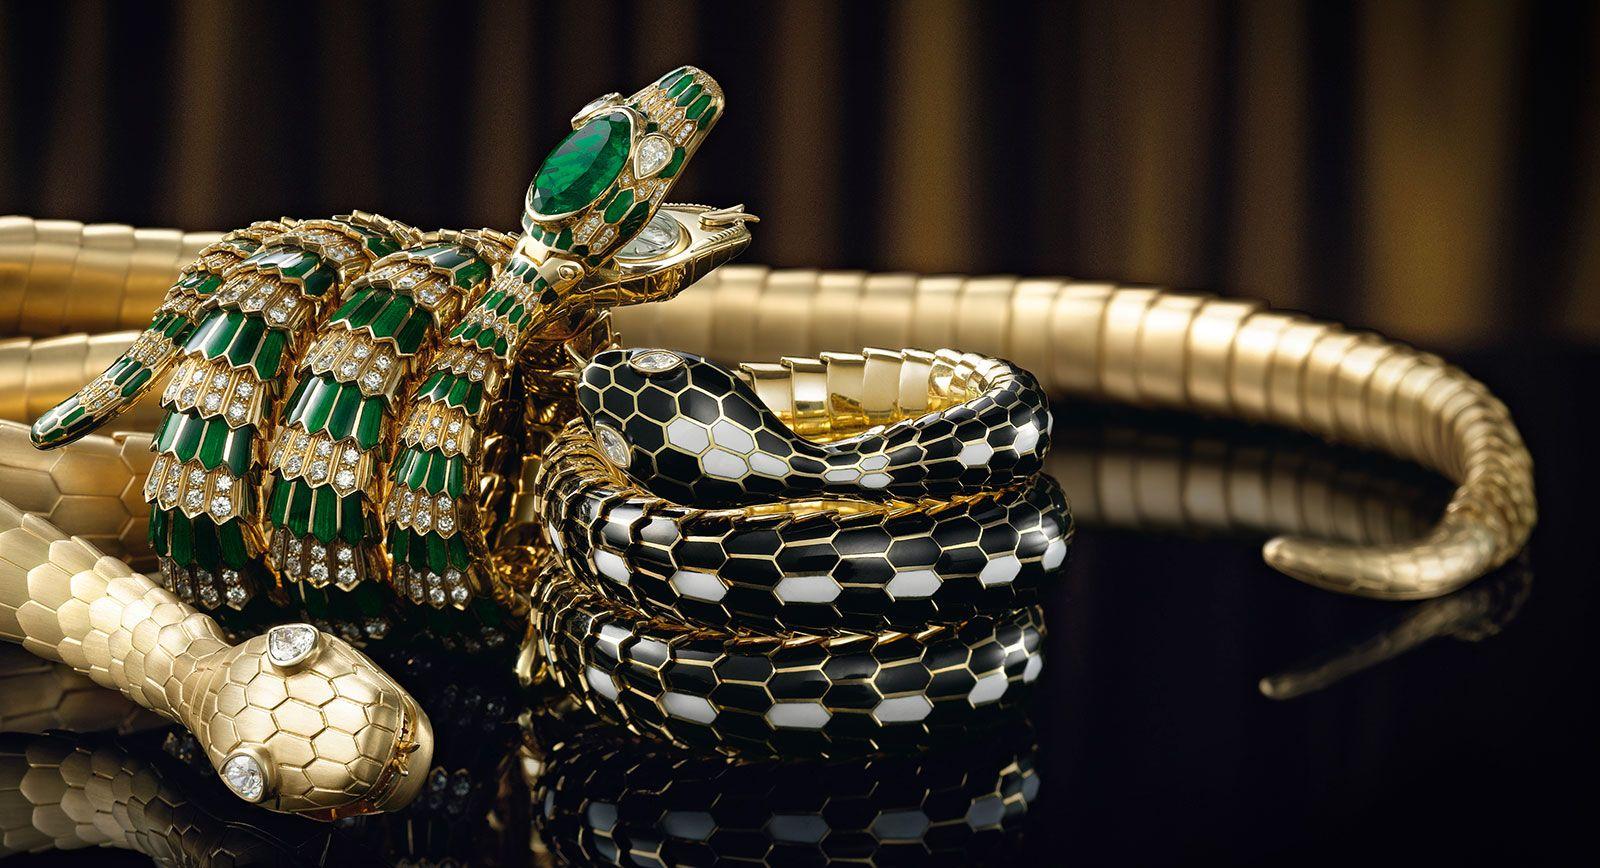 Bvlgari Serpenti Form Exhibition Celebration Of The